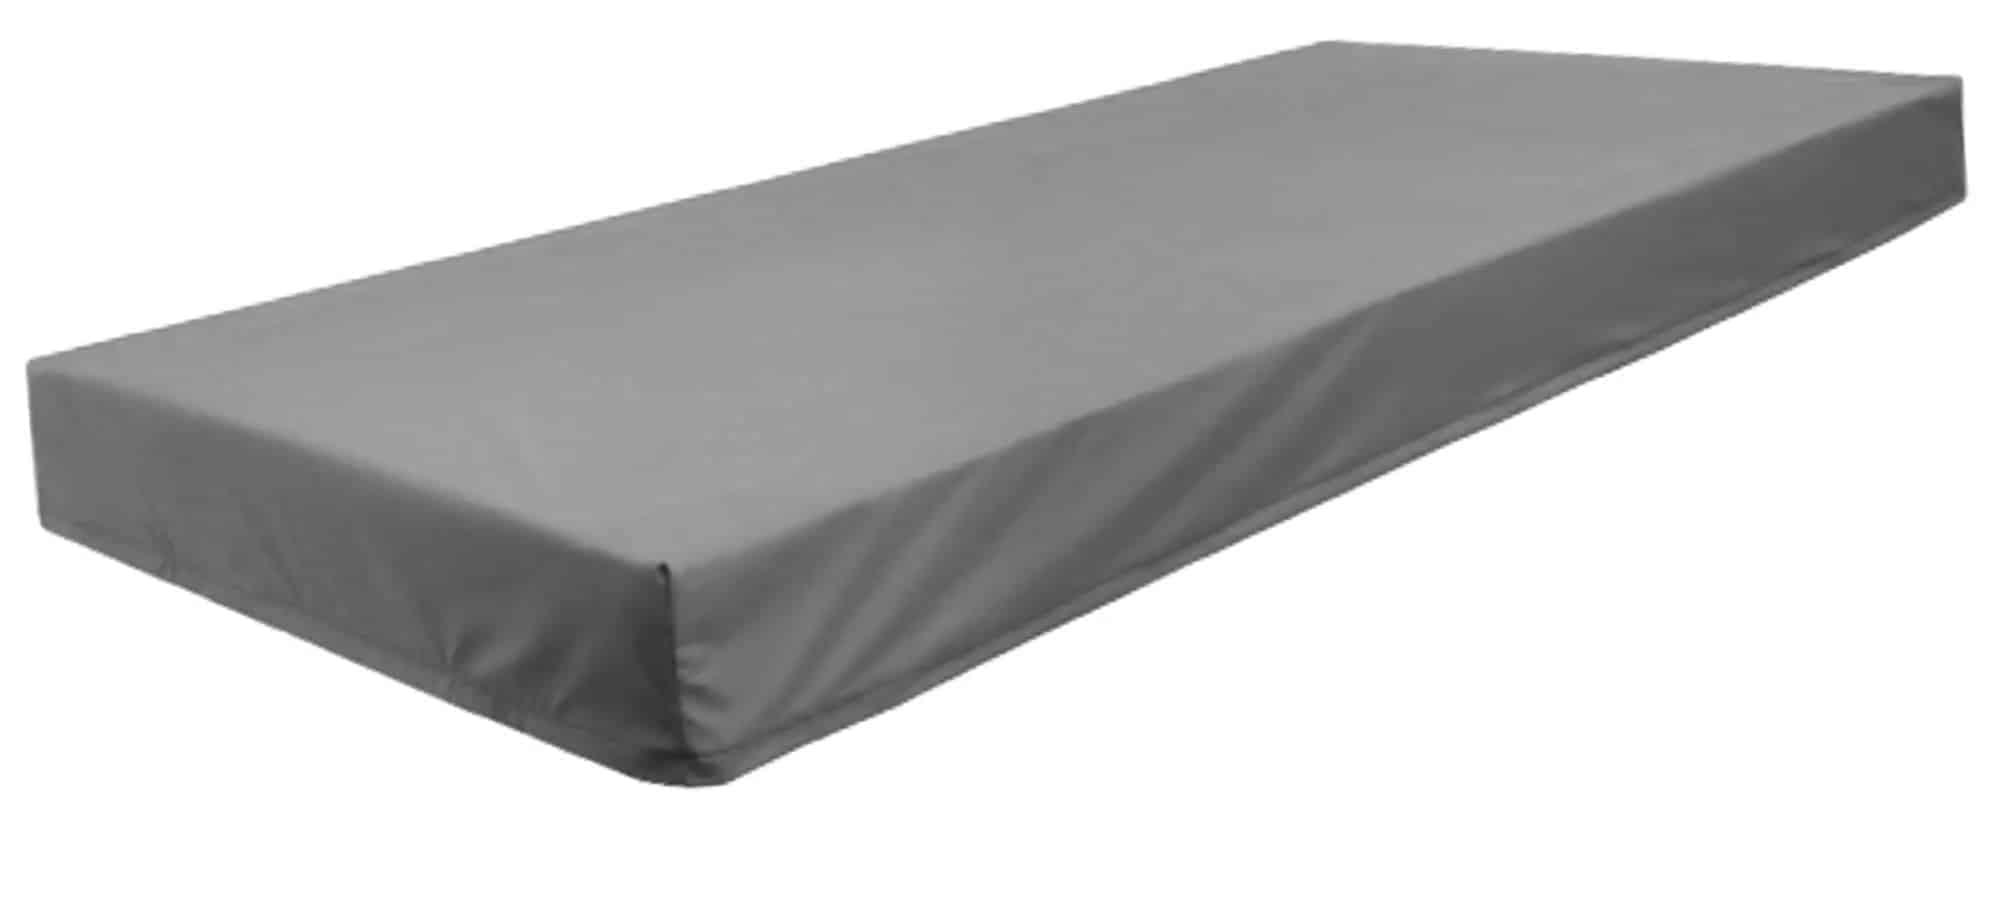 hospital bed mattresses Hospital Bed Mattresses and Hospital Style Mattress